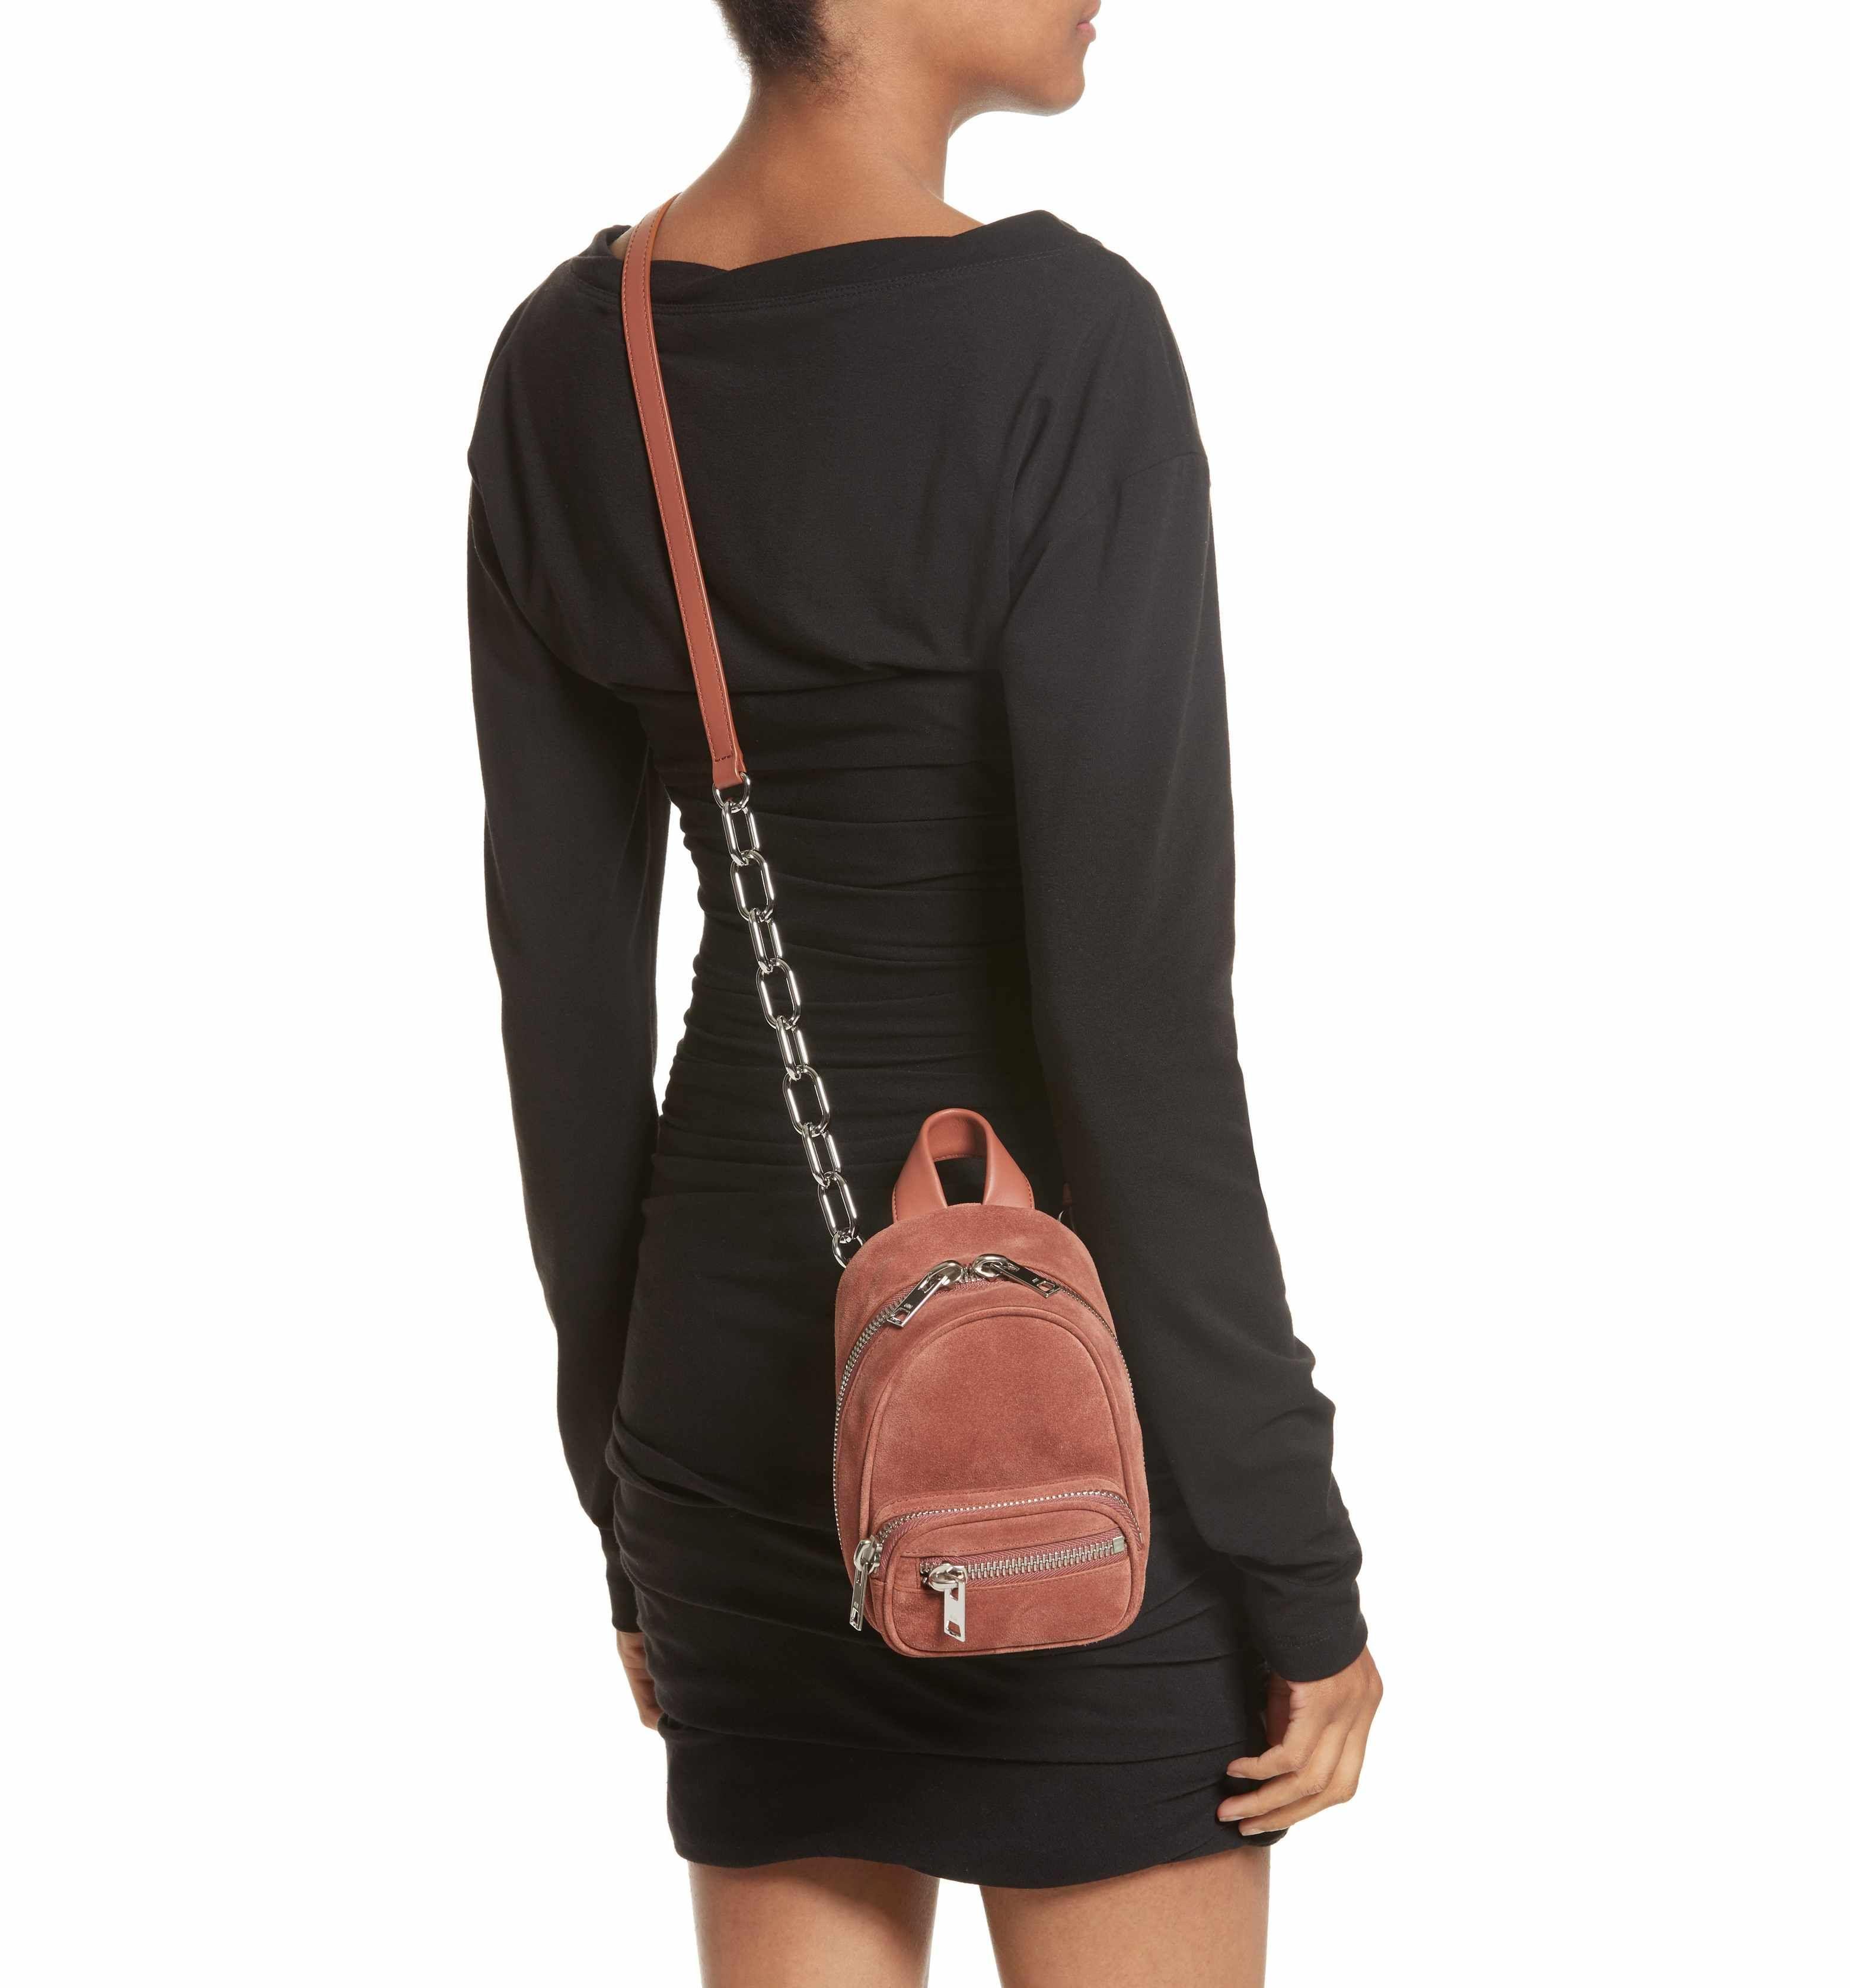 d0f590ccd8 Main Image - Alexander Wang Mini Attica Suede Backpack-Shaped Crossbody Bag